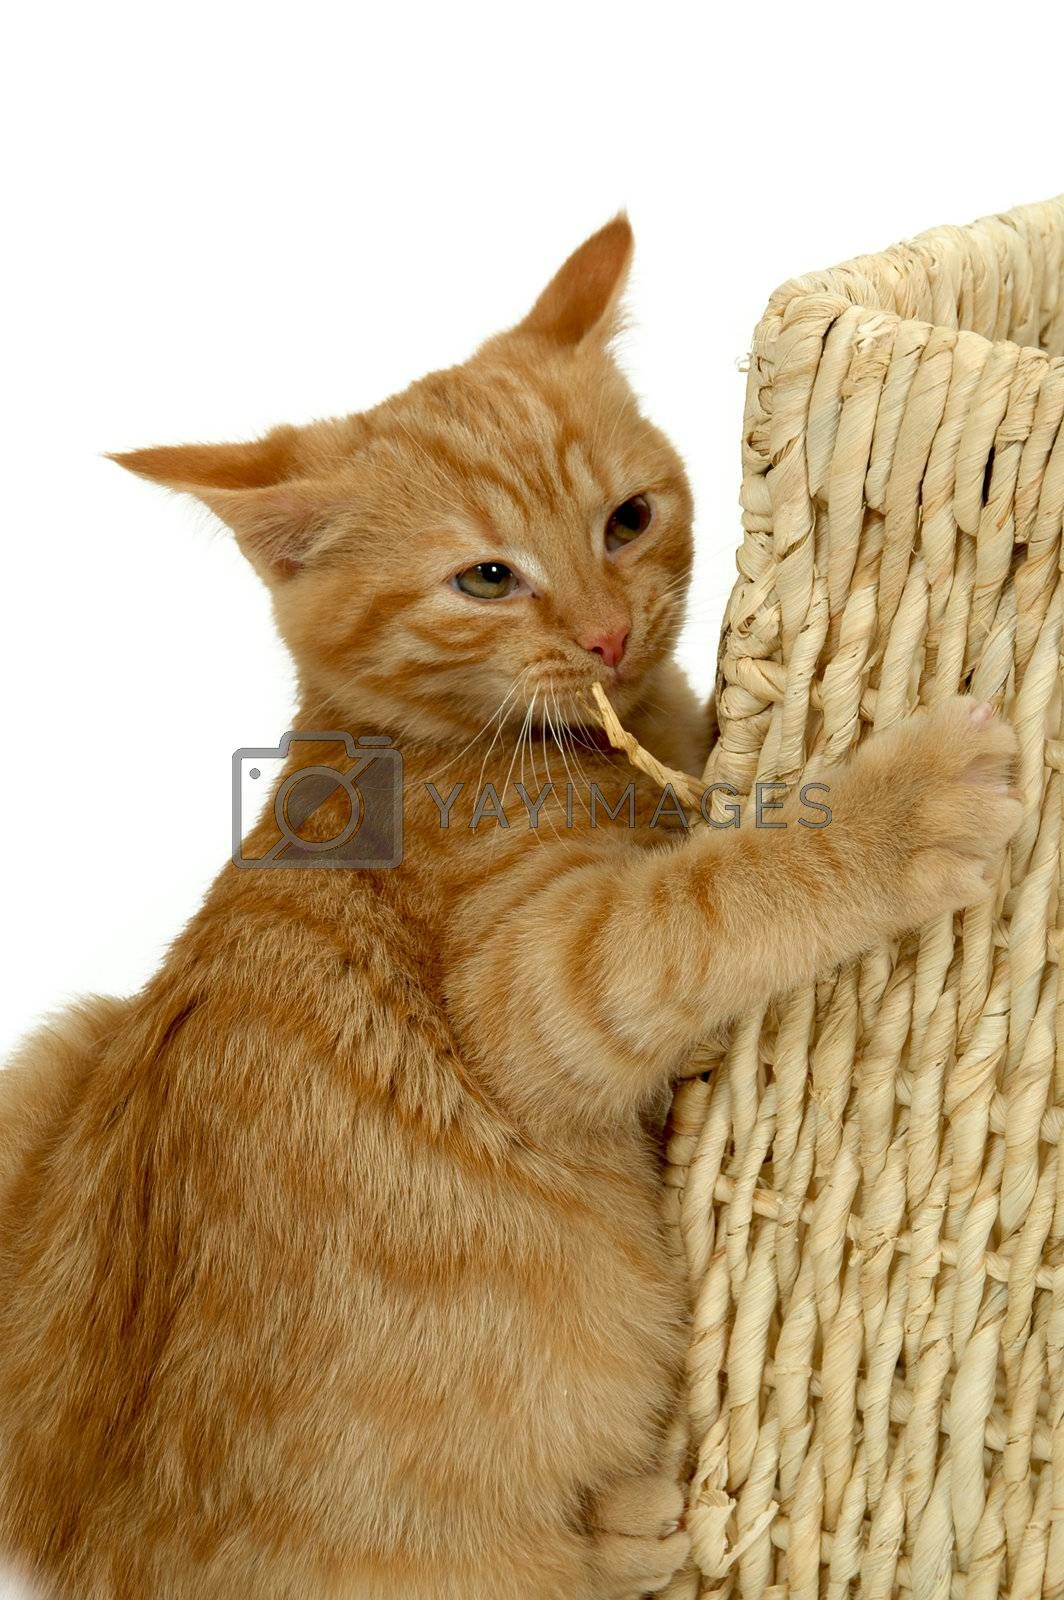 Royalty free image of Foolish kitten by cfoto